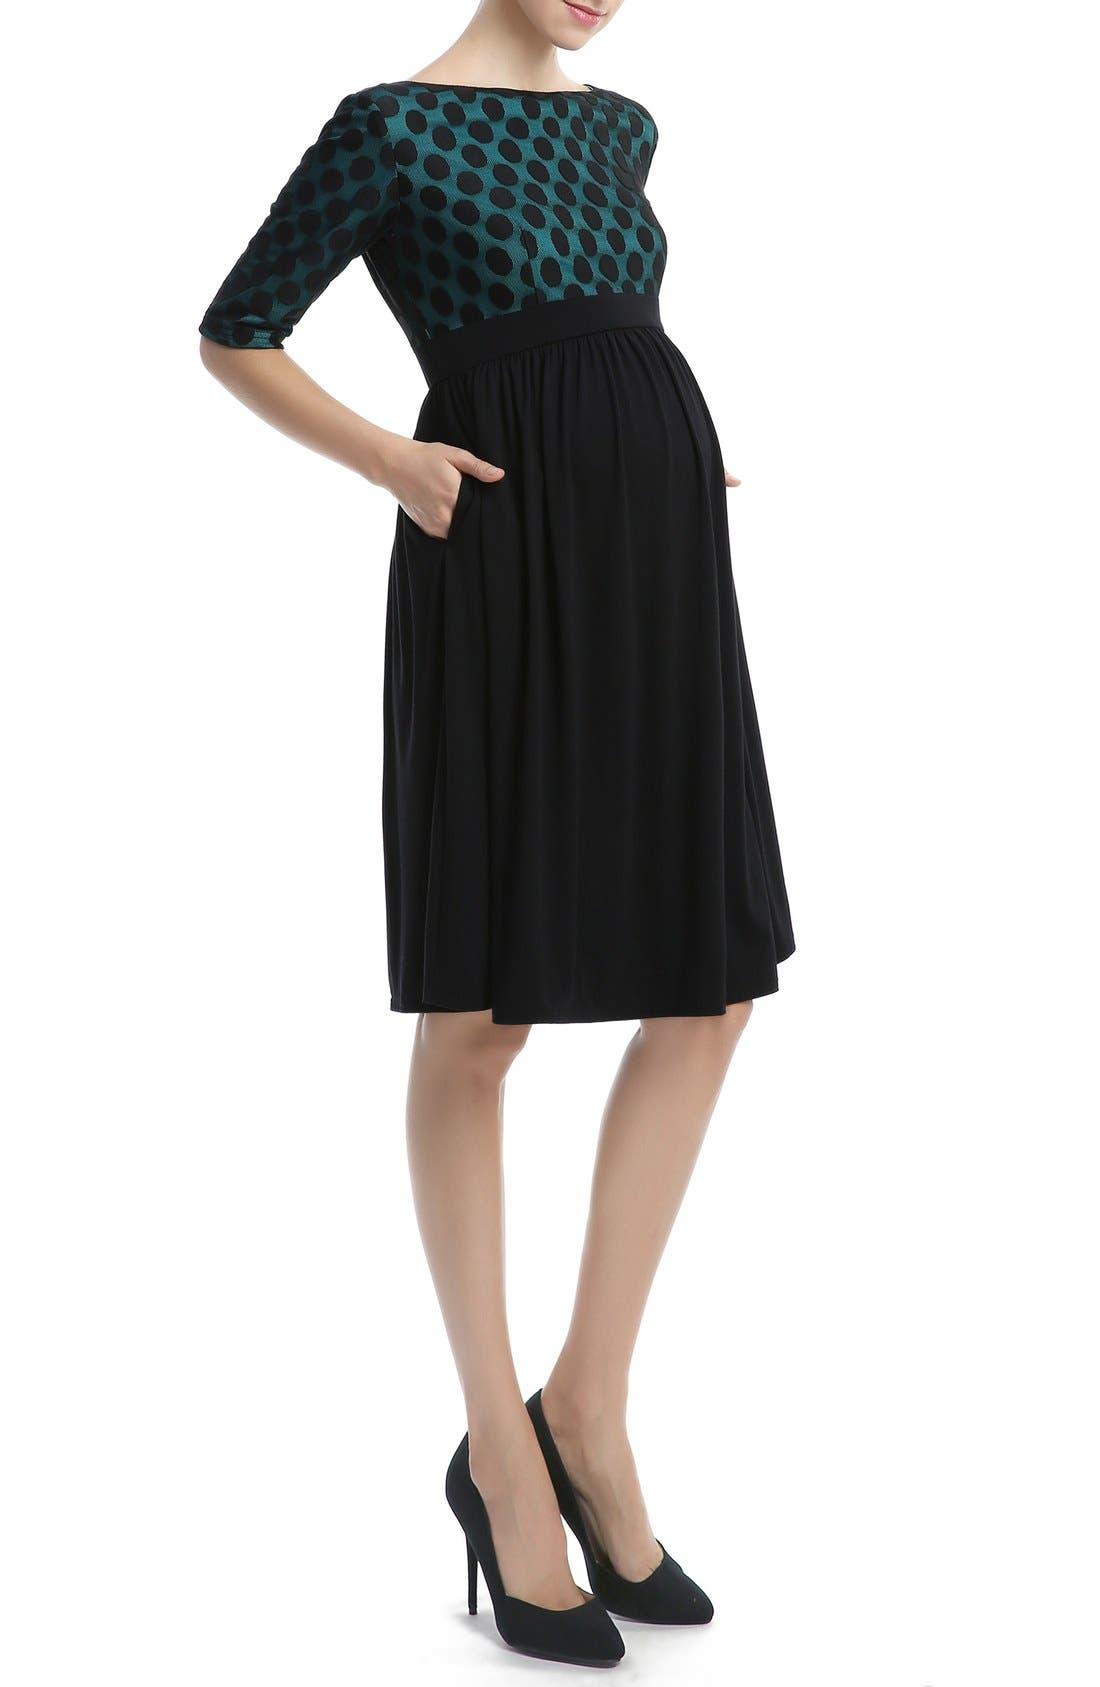 'Charlie' Maternity Dress,                             Alternate thumbnail 3, color,                             Black/ Teal